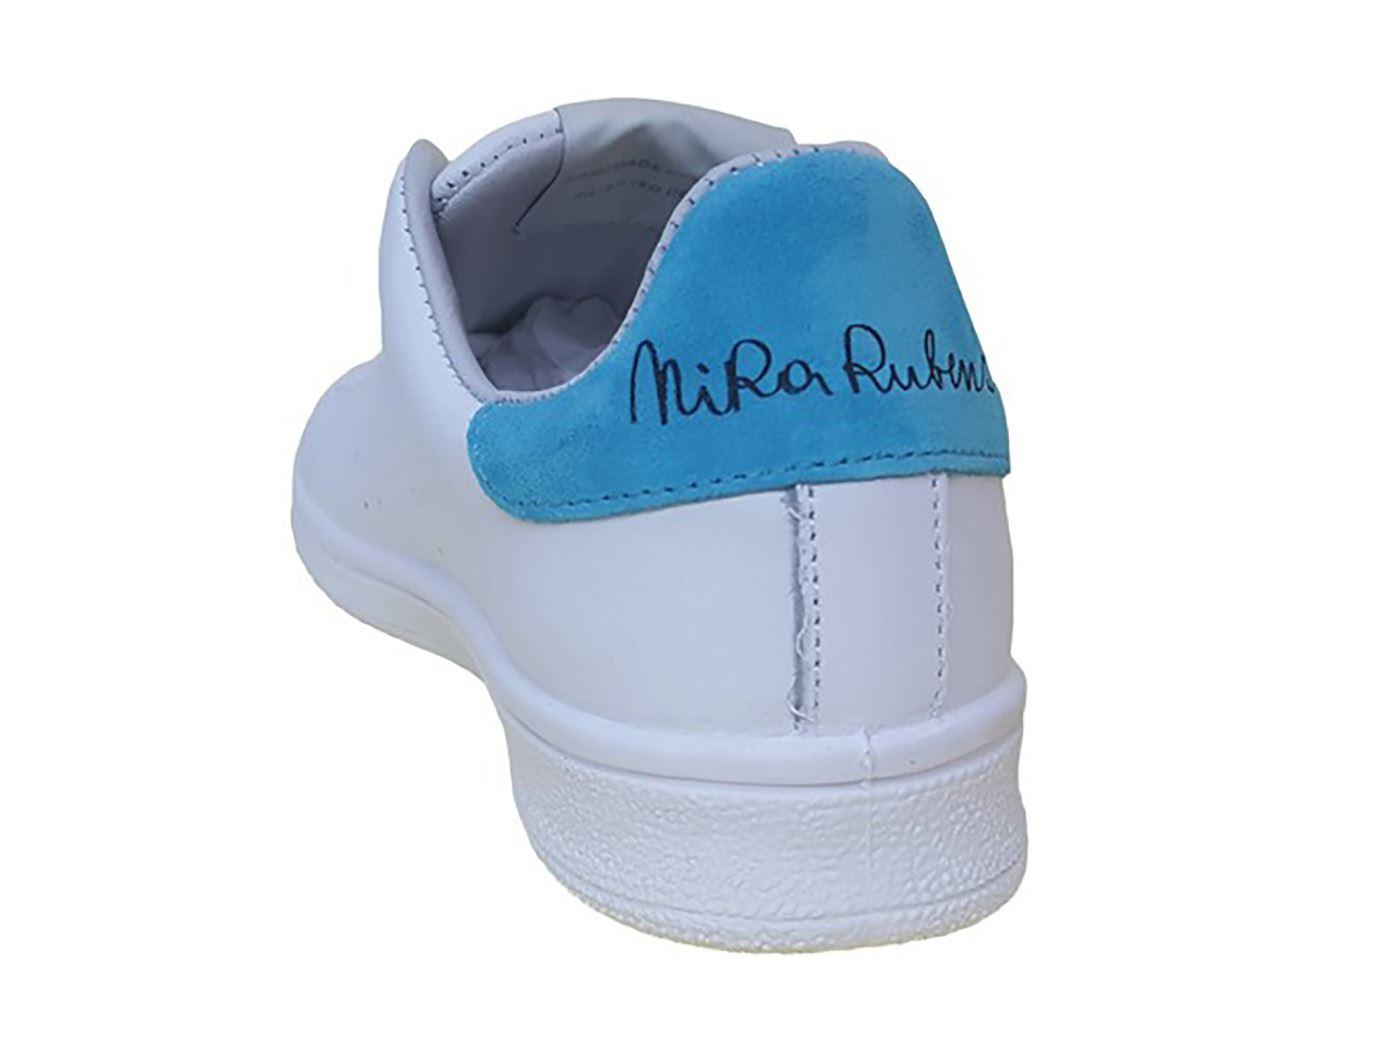 NIRA RUBENS DACU91 DAIQUIRI CUORE  BIANCO BIANCO BIANCO Blau Turnschuhe damen MainApps 86703d